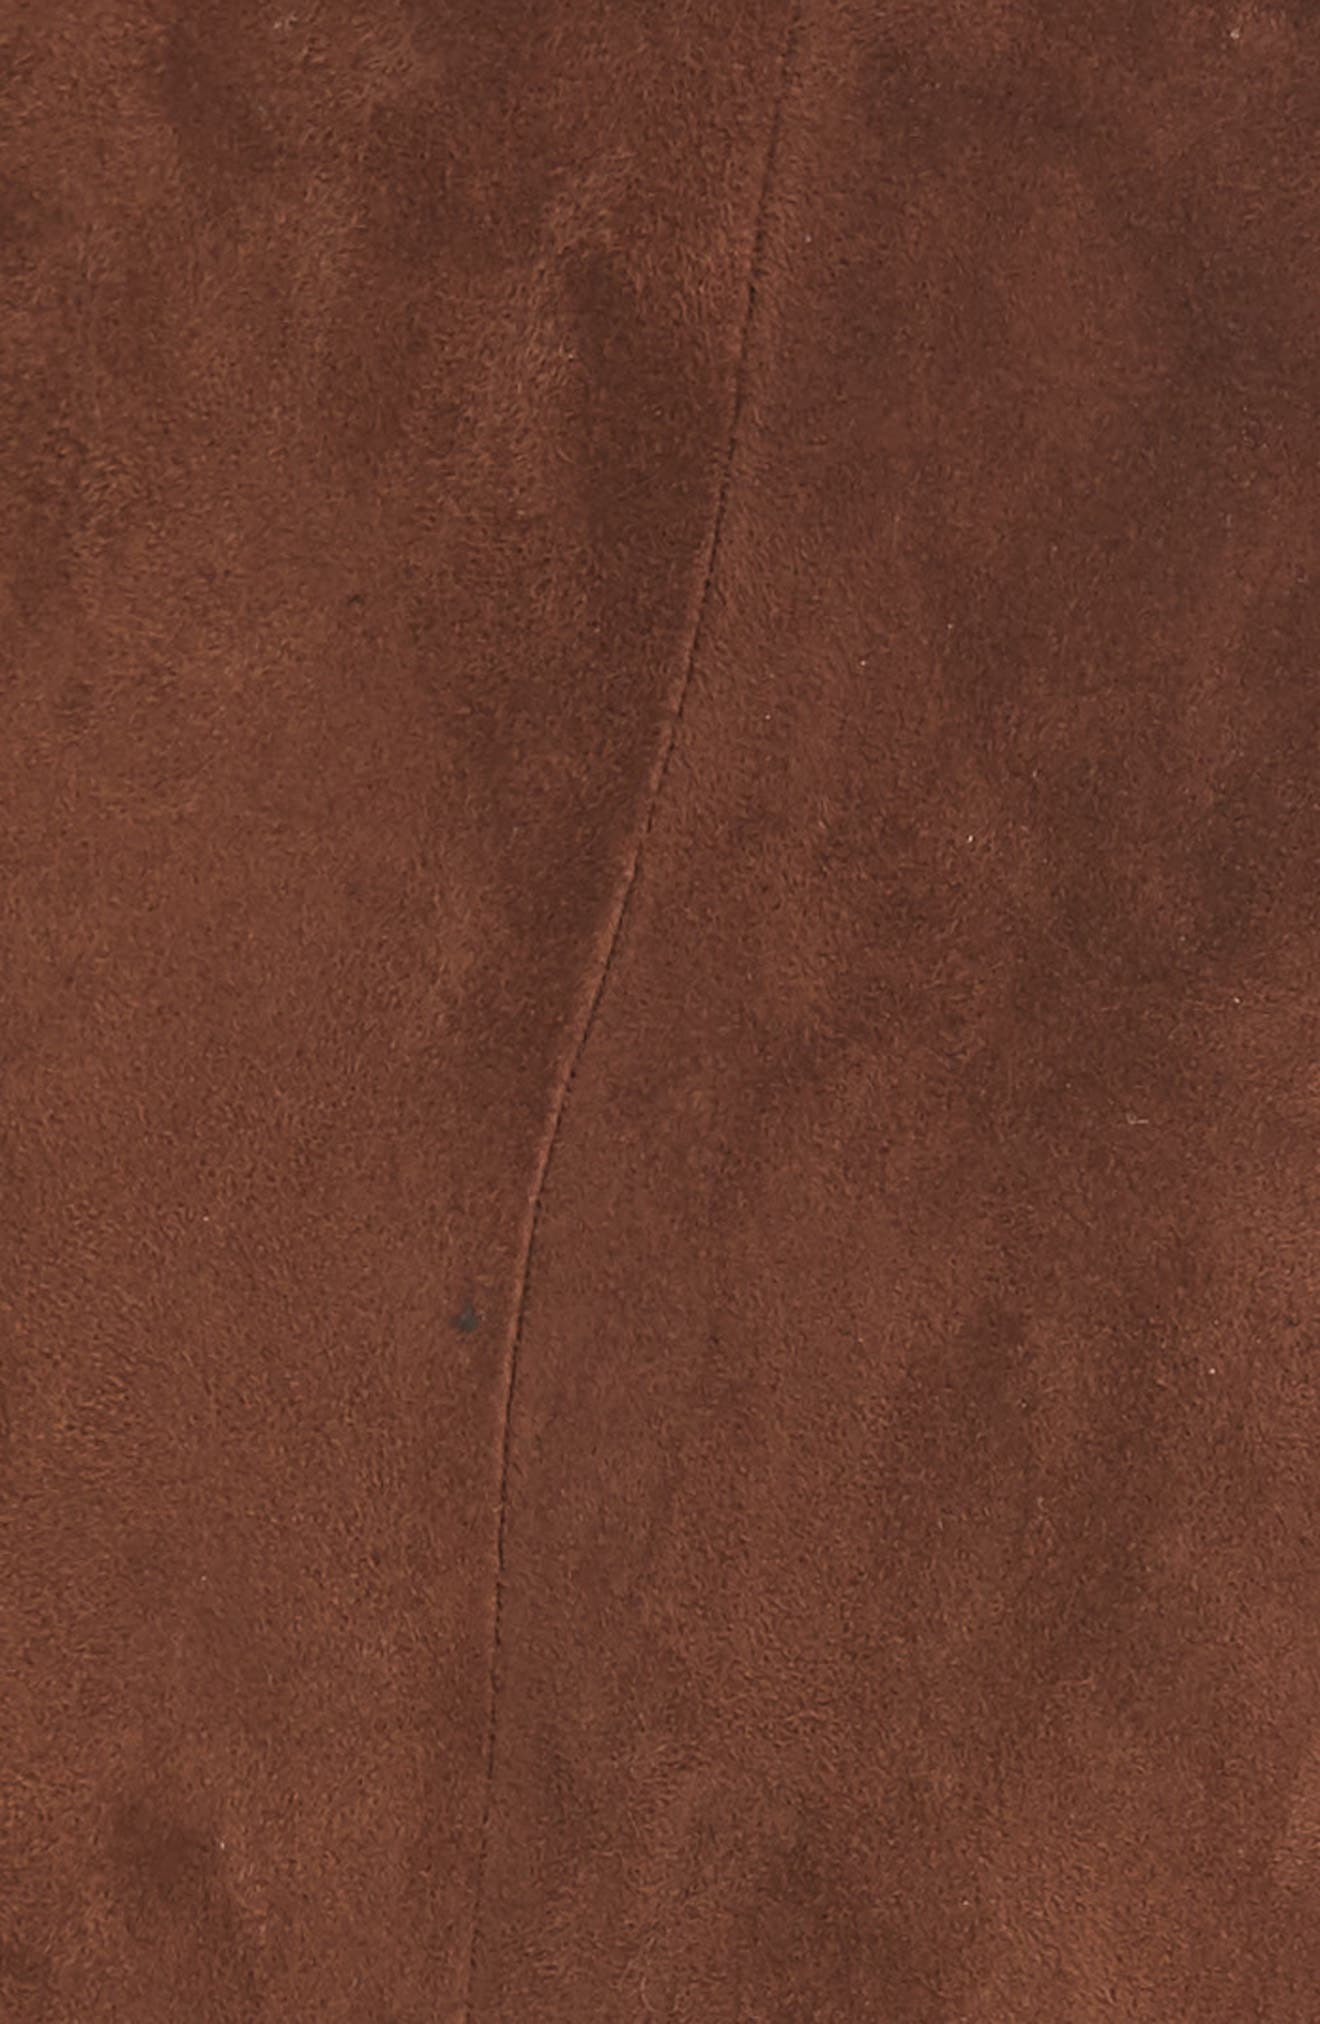 NILI LOTAN, Paris Leather Pants, Alternate thumbnail 6, color, DARK COGNAC